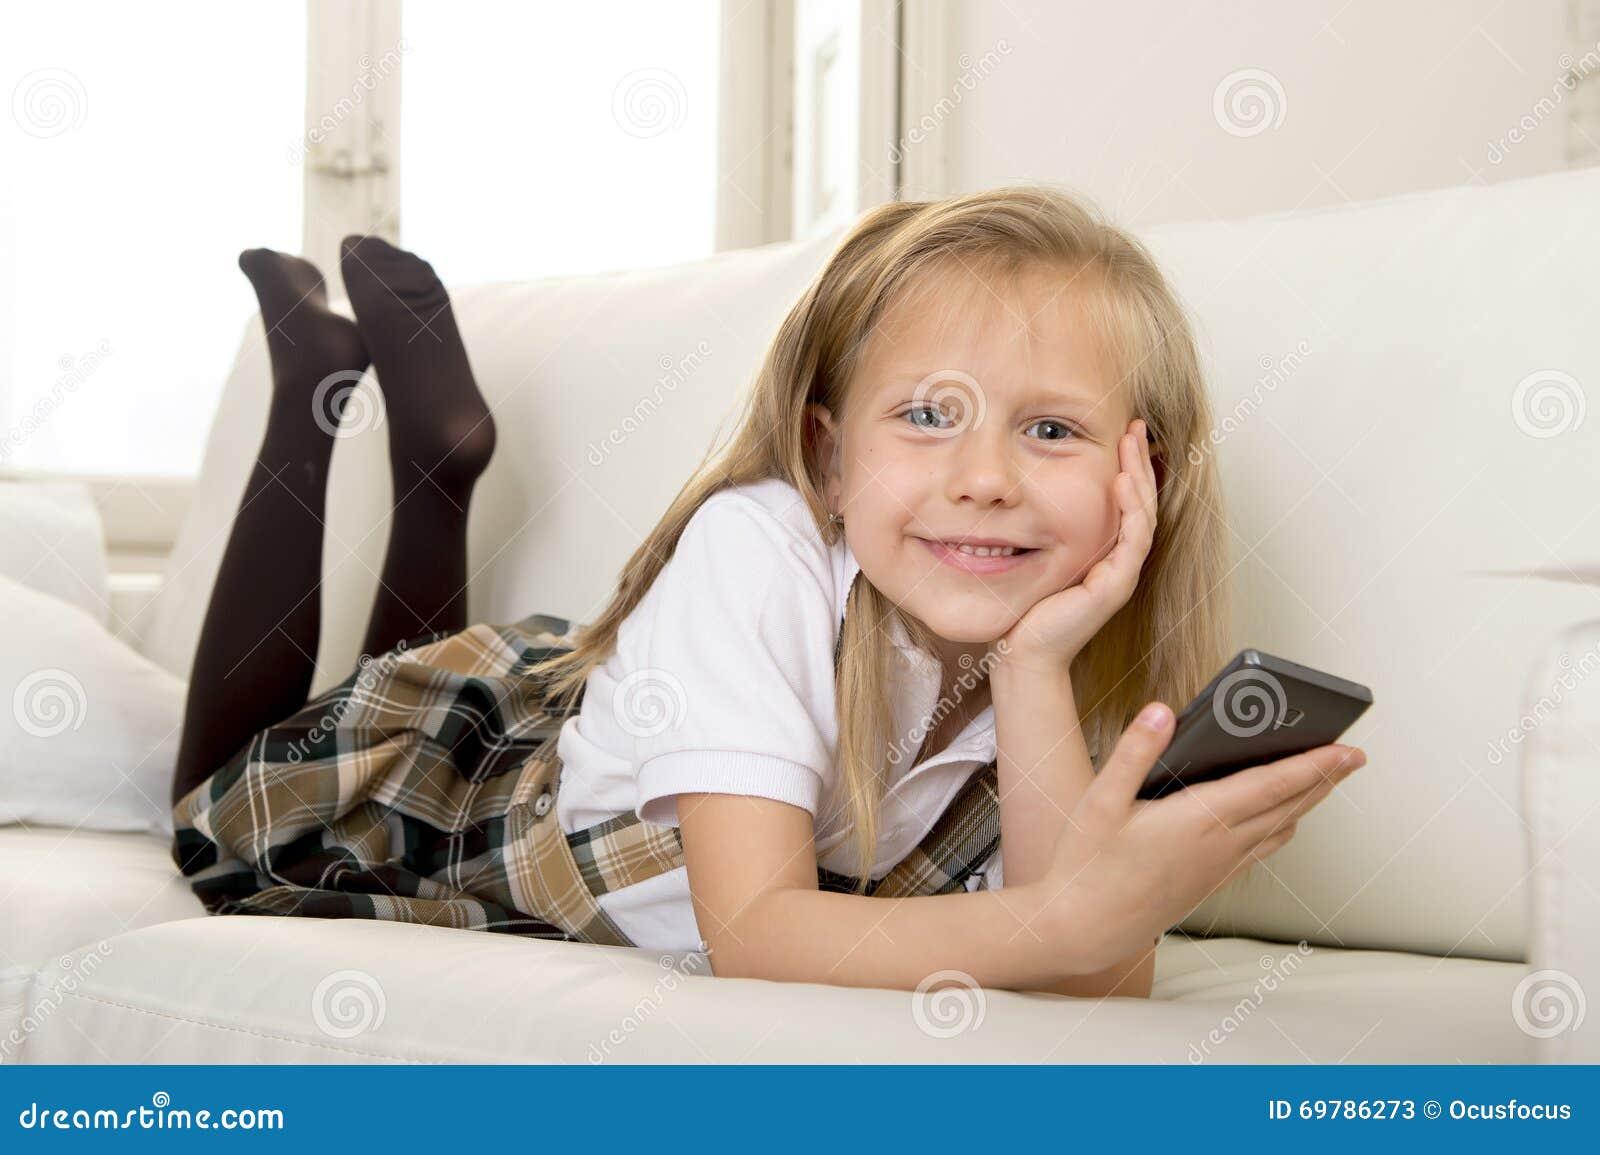 cute panty girl on sofa